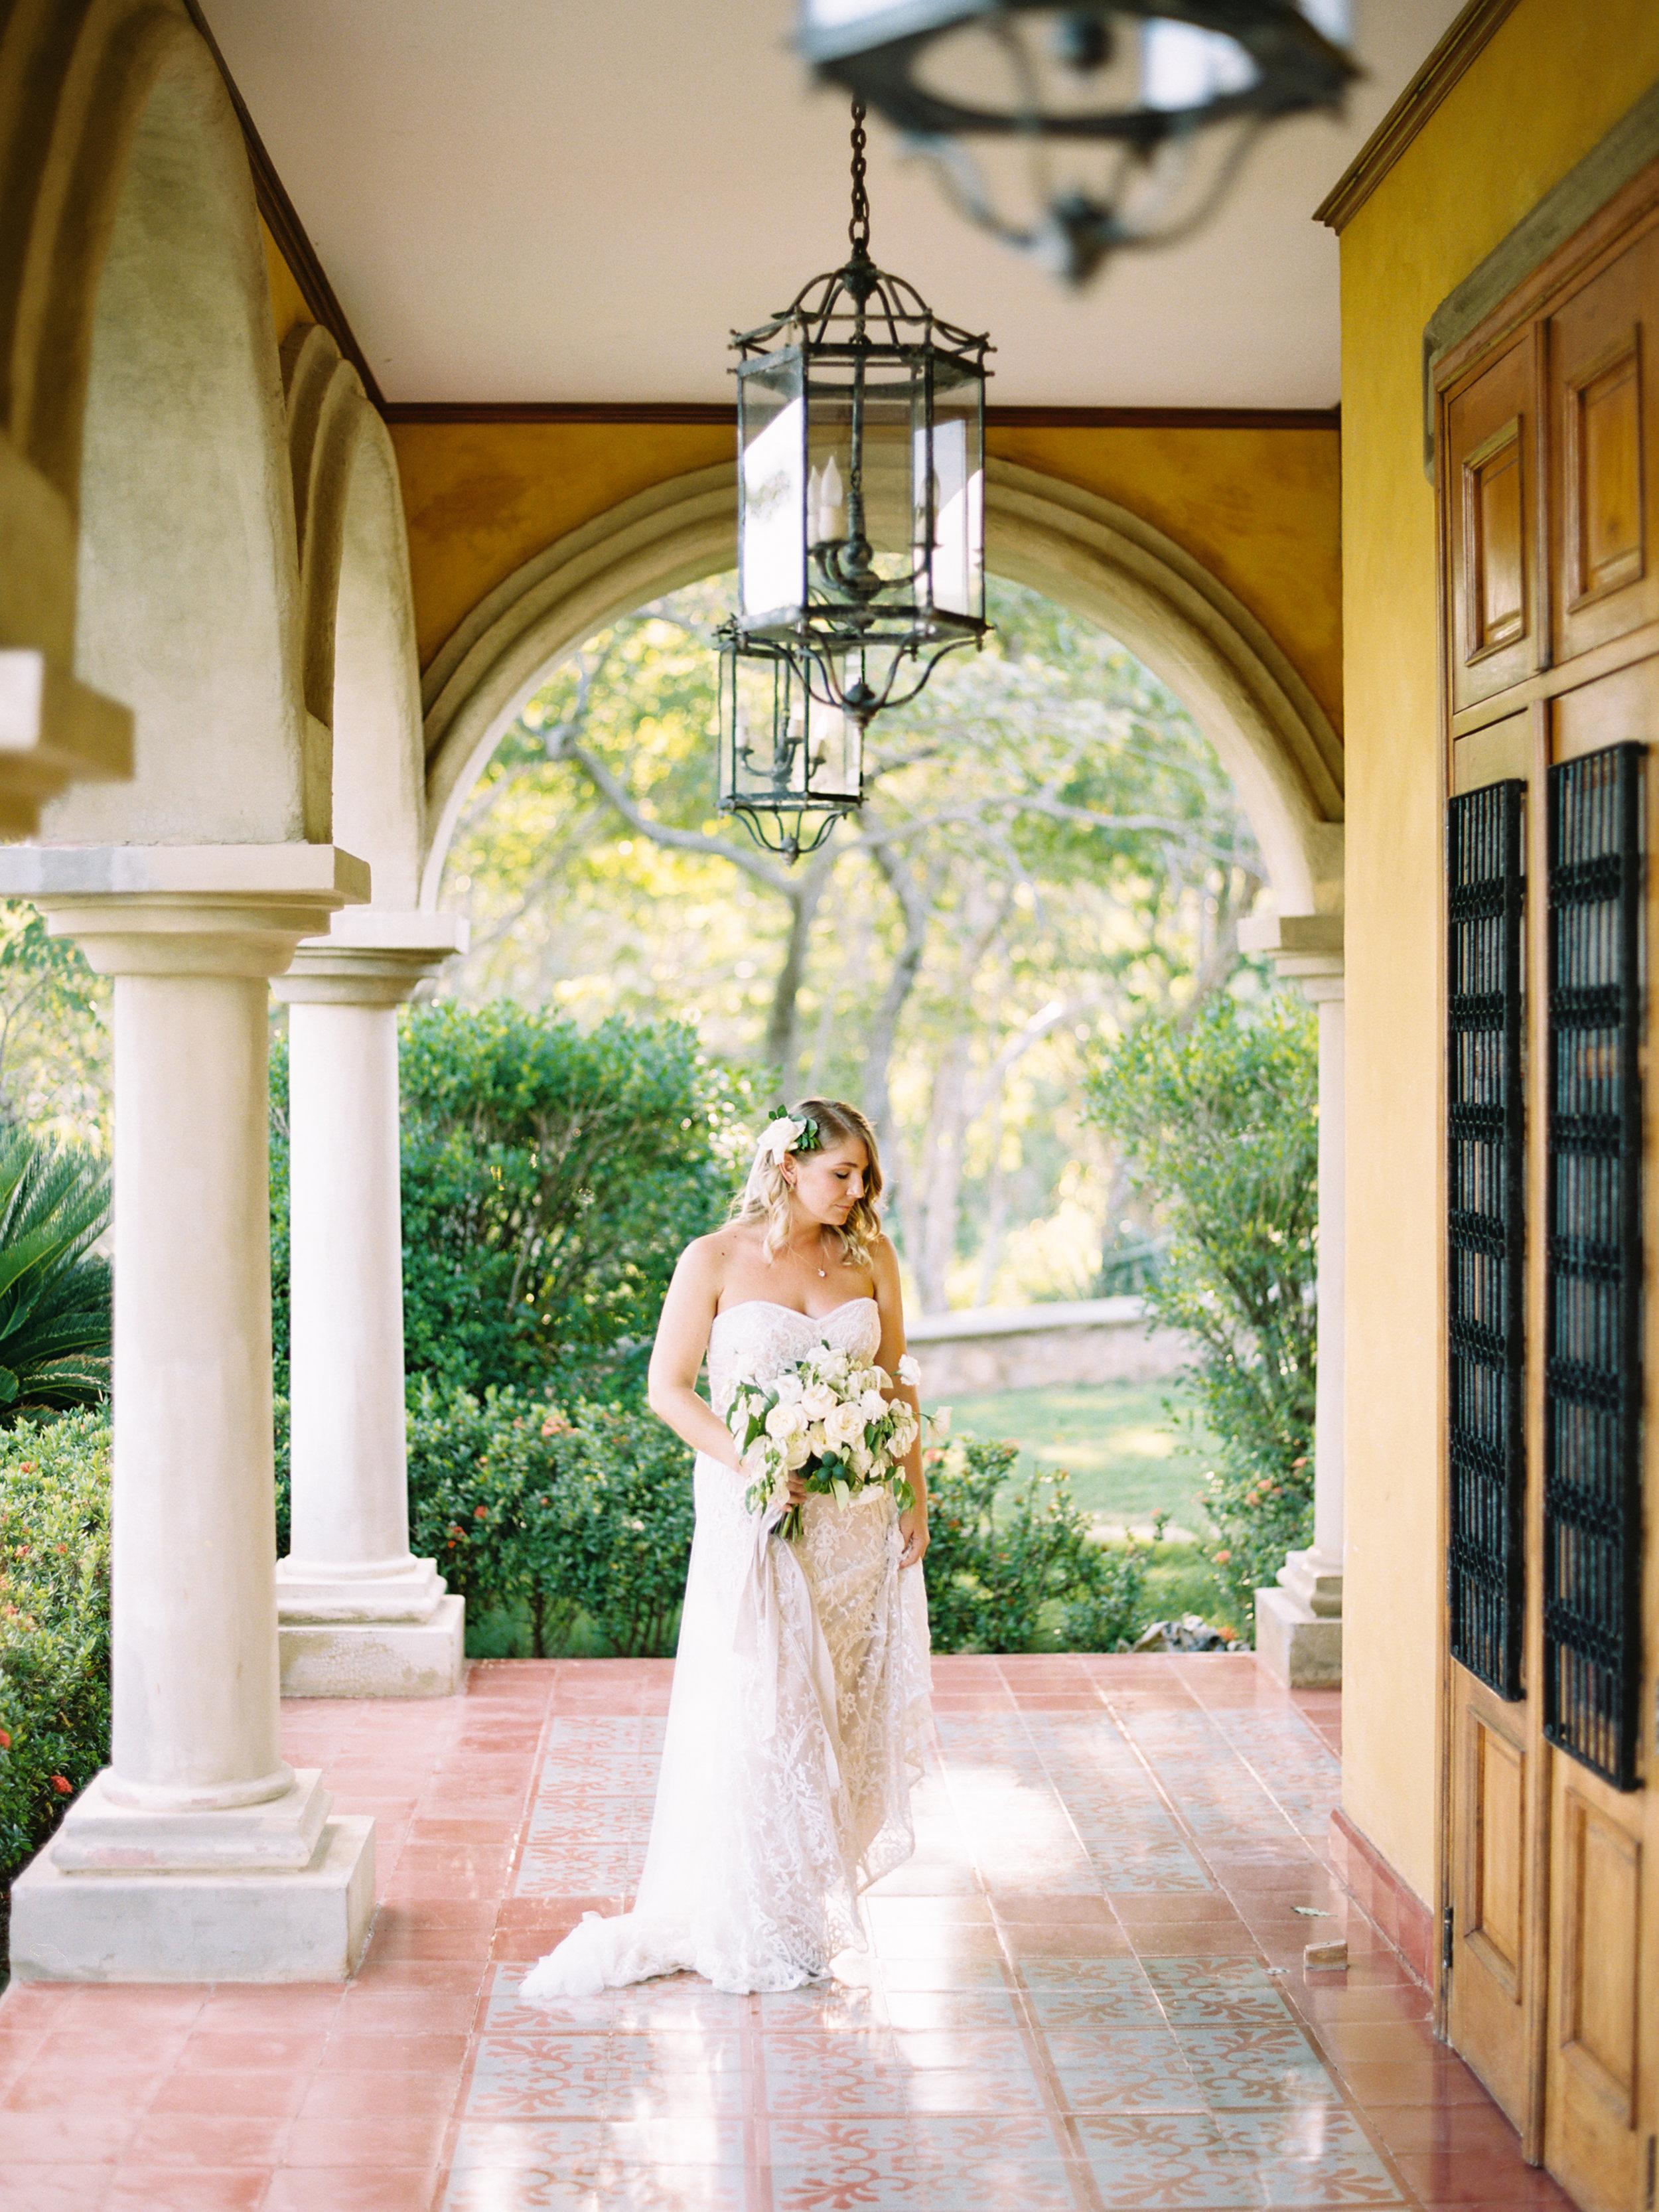 424-fine-art-film-photographer-destination-wedding-nicaragua-jacob+cammye-brumley & wells.jpg